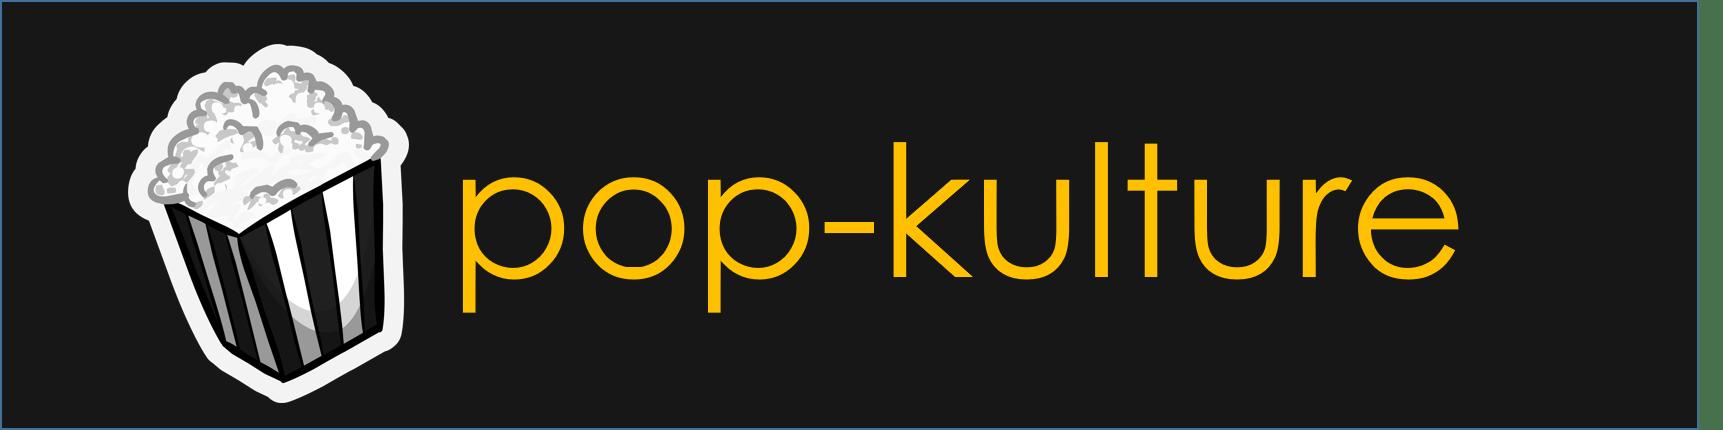 pop-kulture-logo